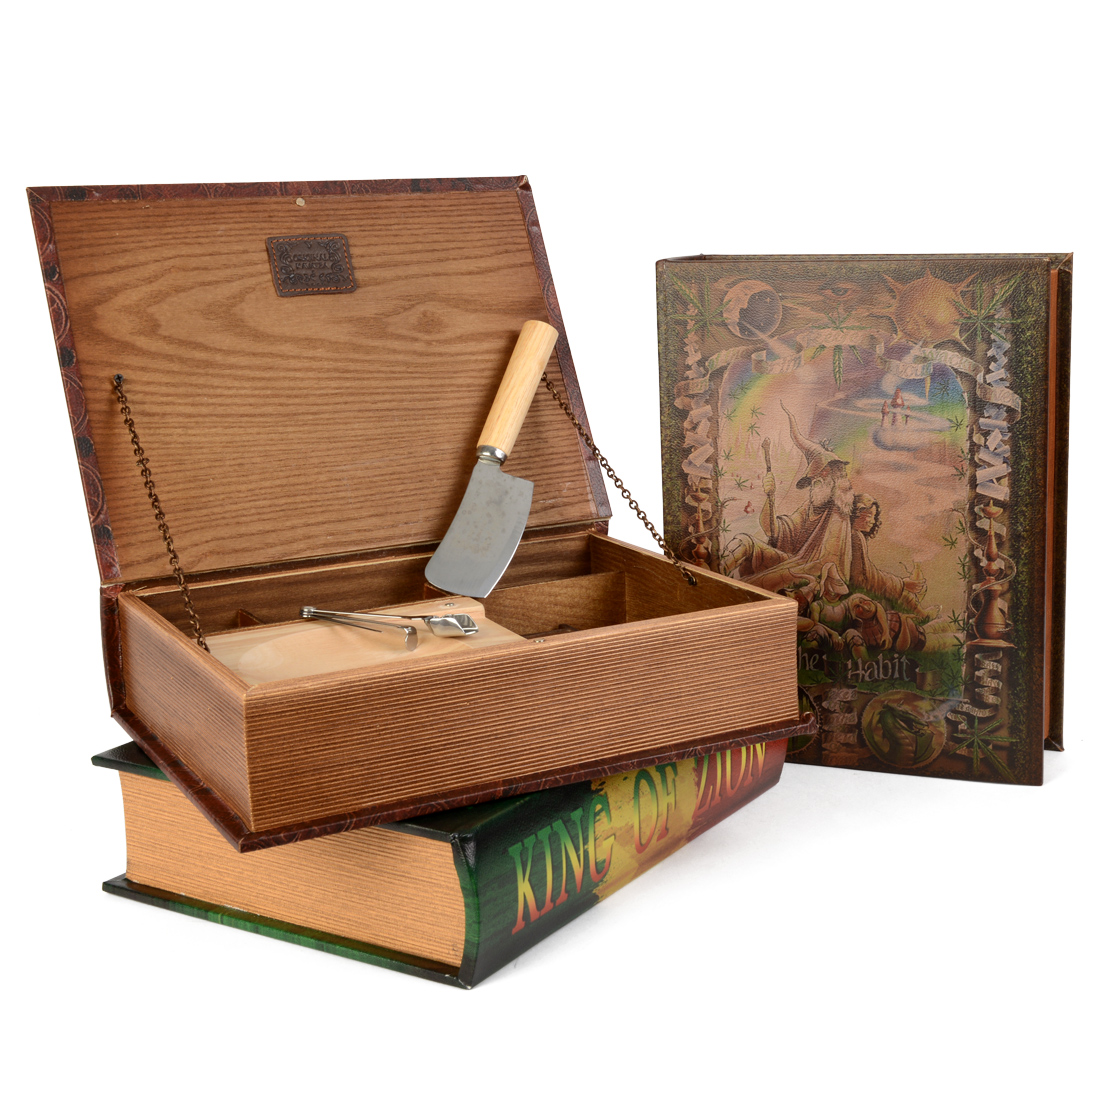 boite grimoire livre rangement acheter boites en bois. Black Bedroom Furniture Sets. Home Design Ideas